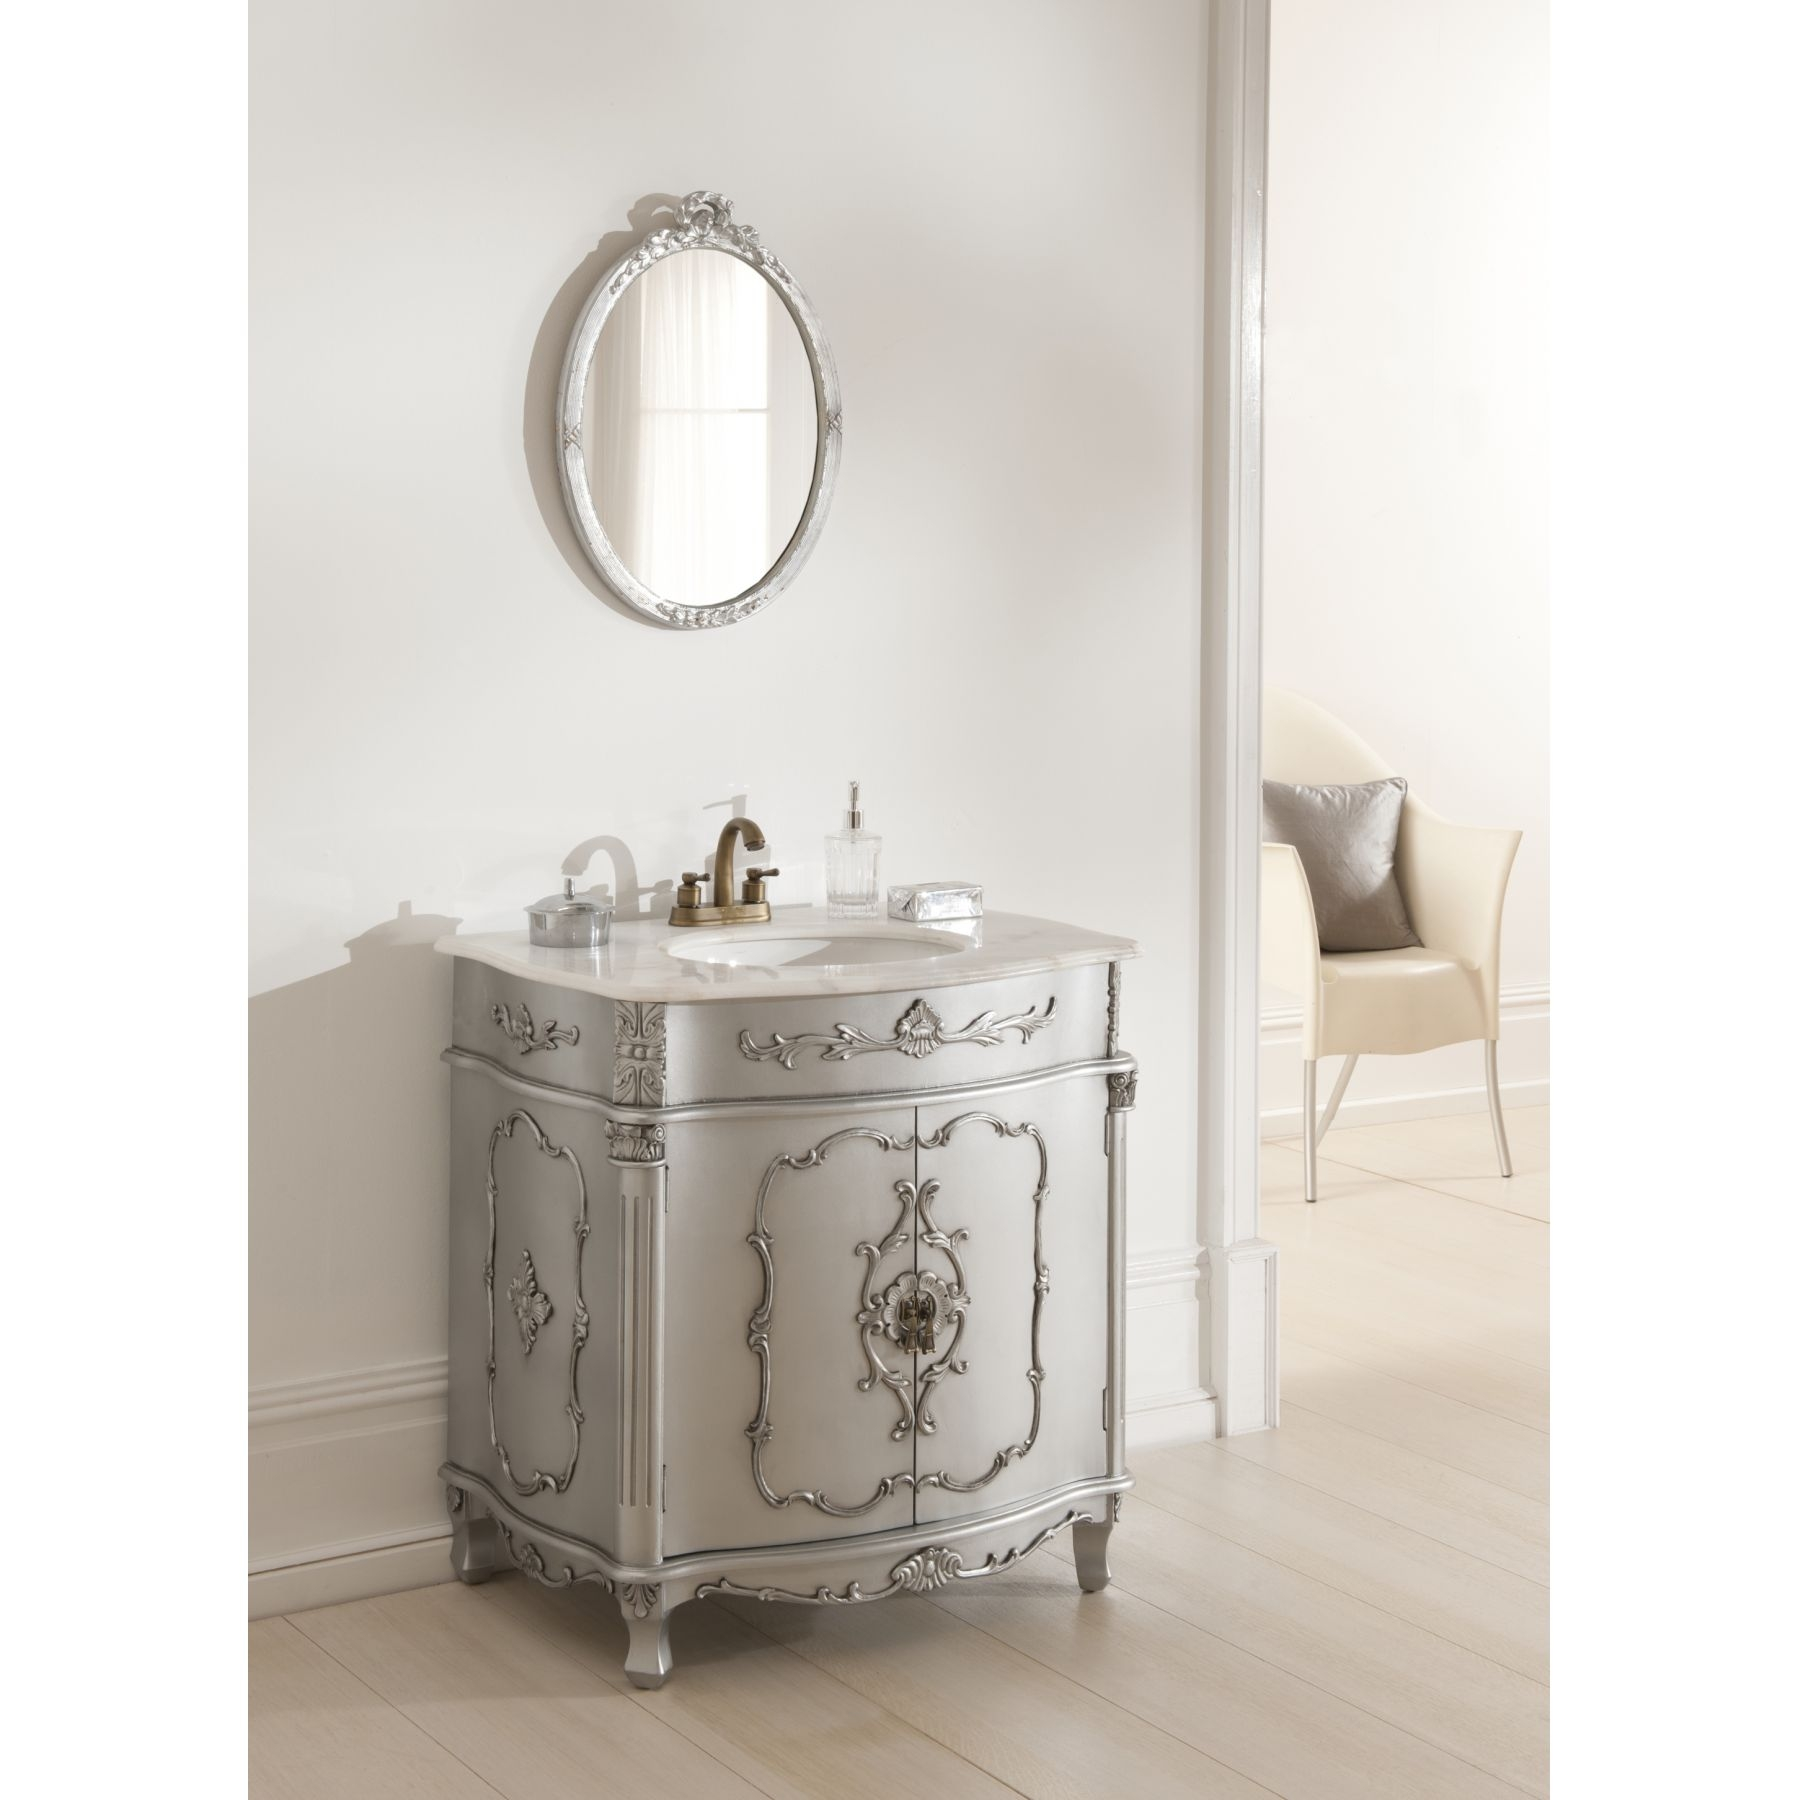 15 Photos Vintage Bathroom Mirrors Sale  Mirror Ideas